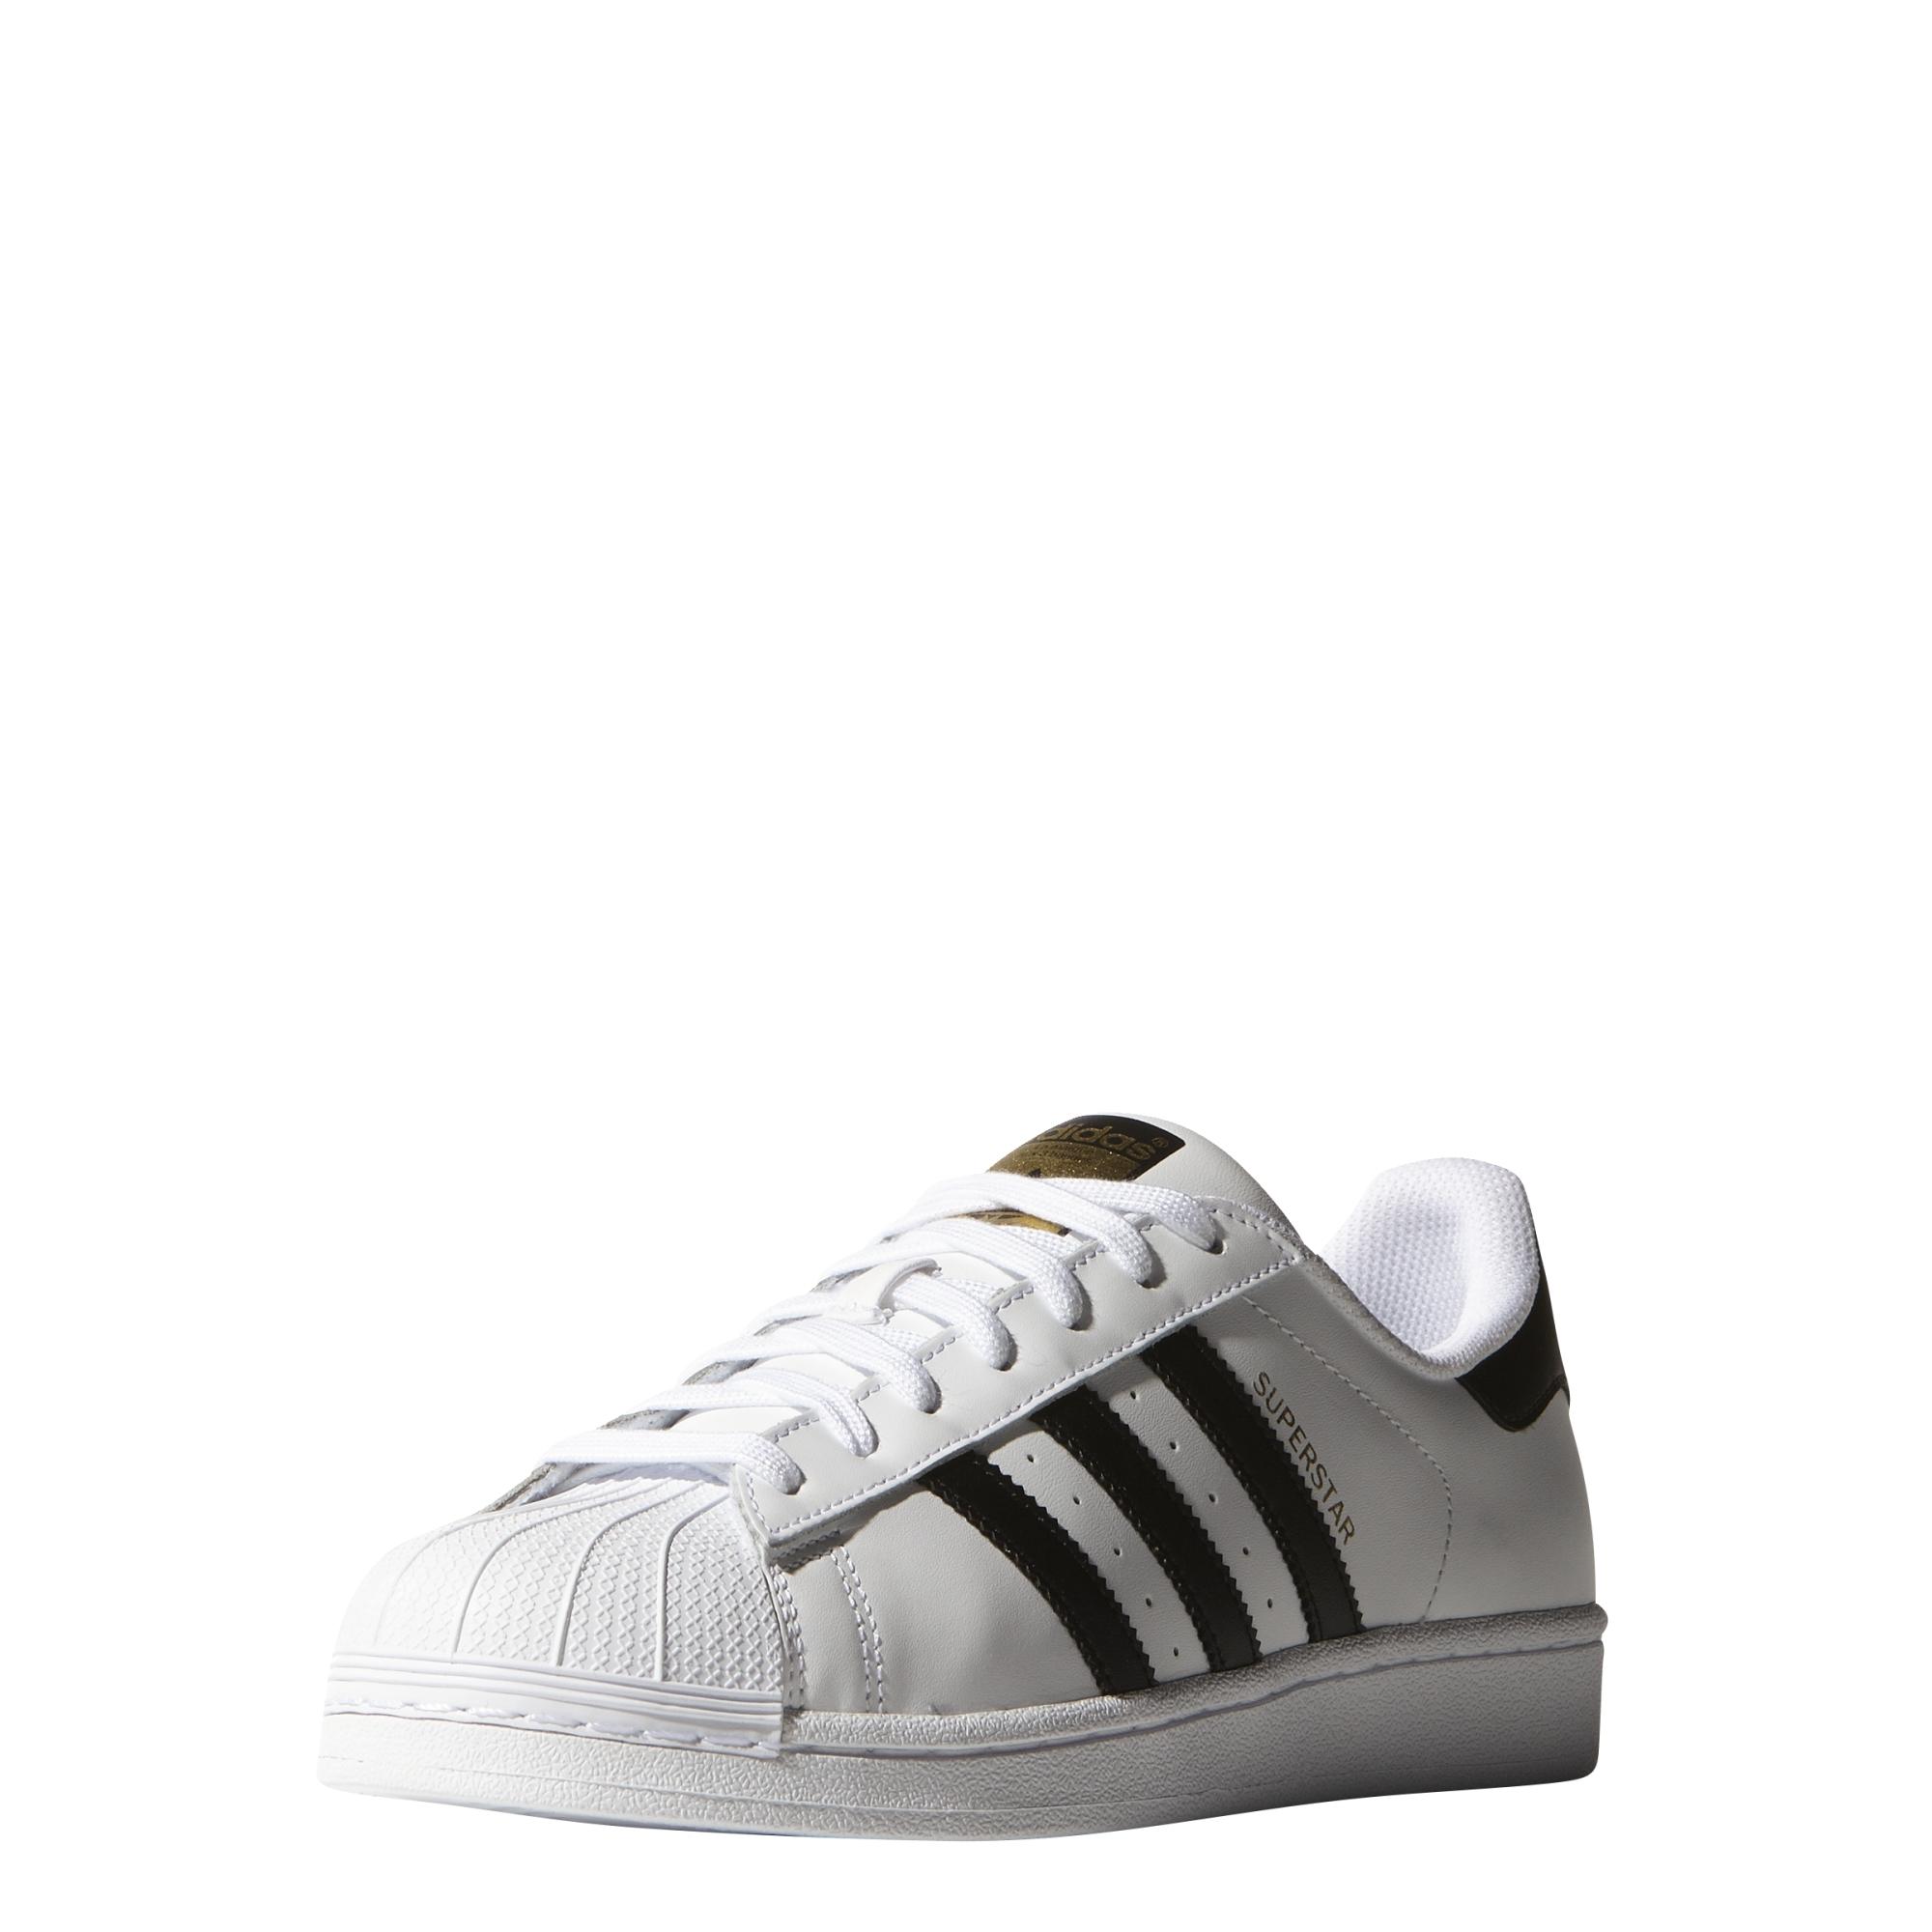 Buty damskie adidas superstar shell toe pack 39 46 Zdjęcie